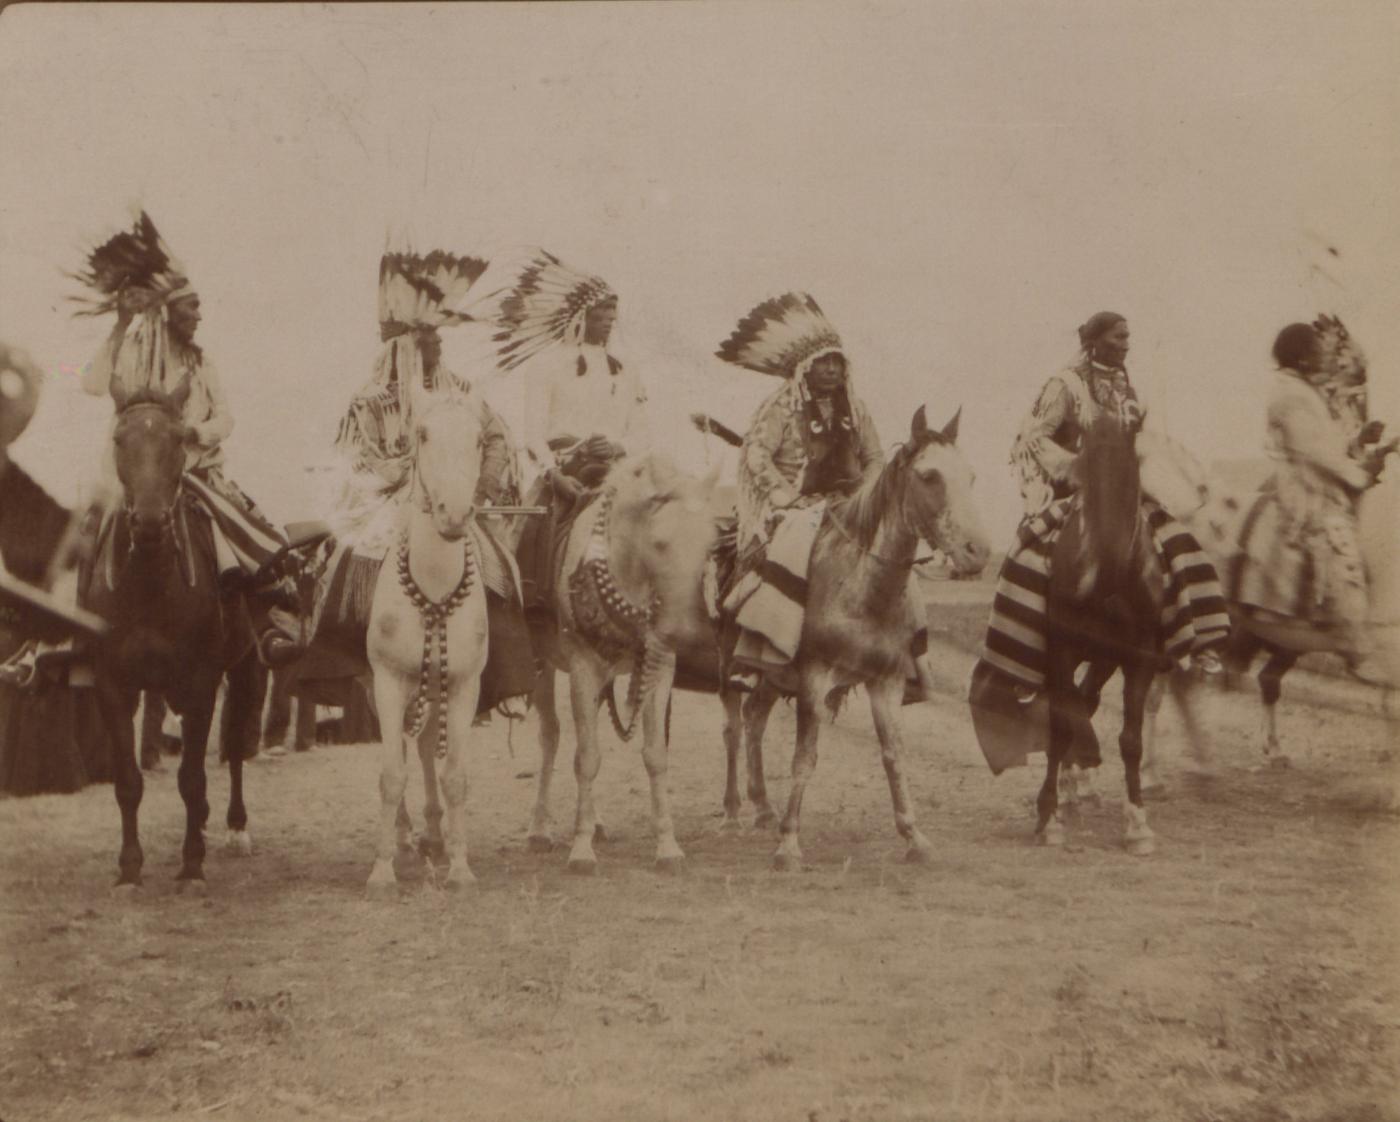 File:Blackfoot Indian braves (HS85-10-18745) jpg - Wikimedia